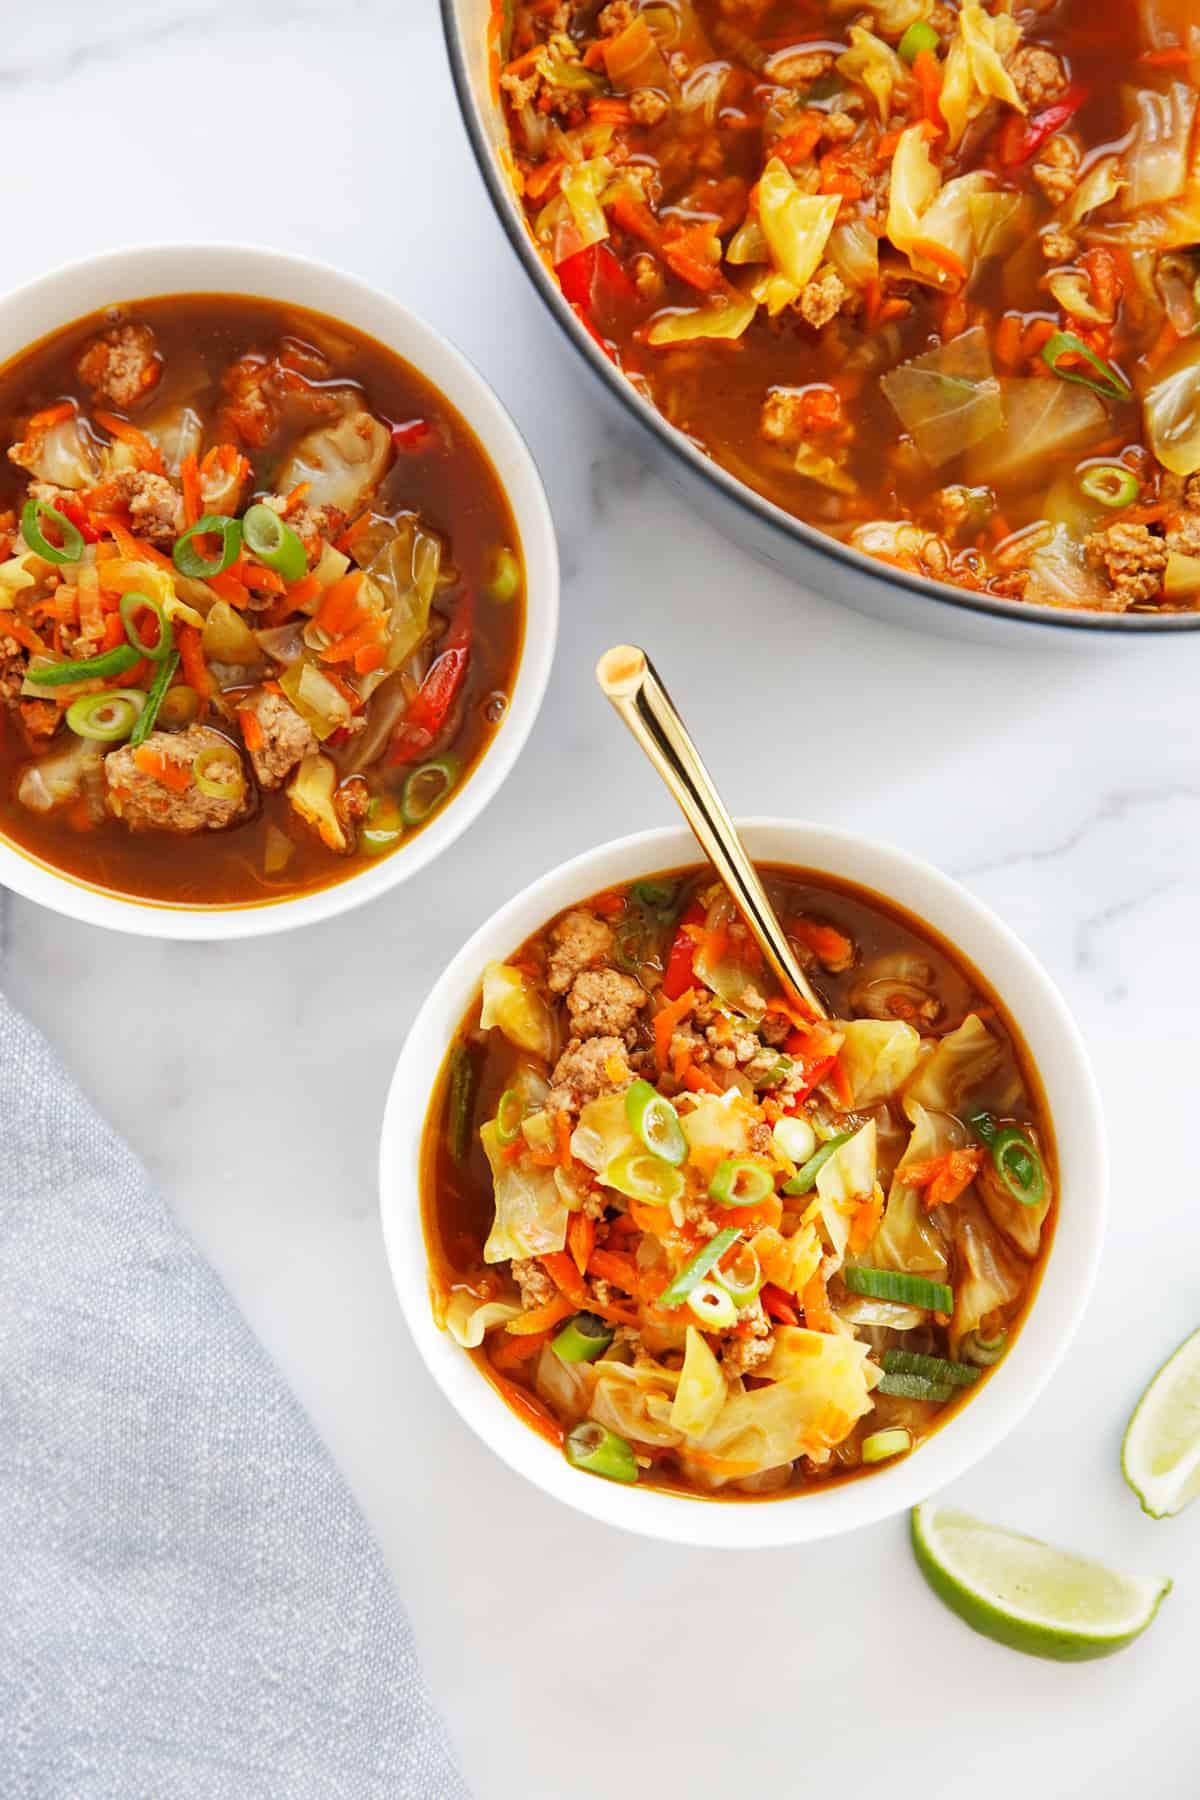 Servings of easy egg roll soup